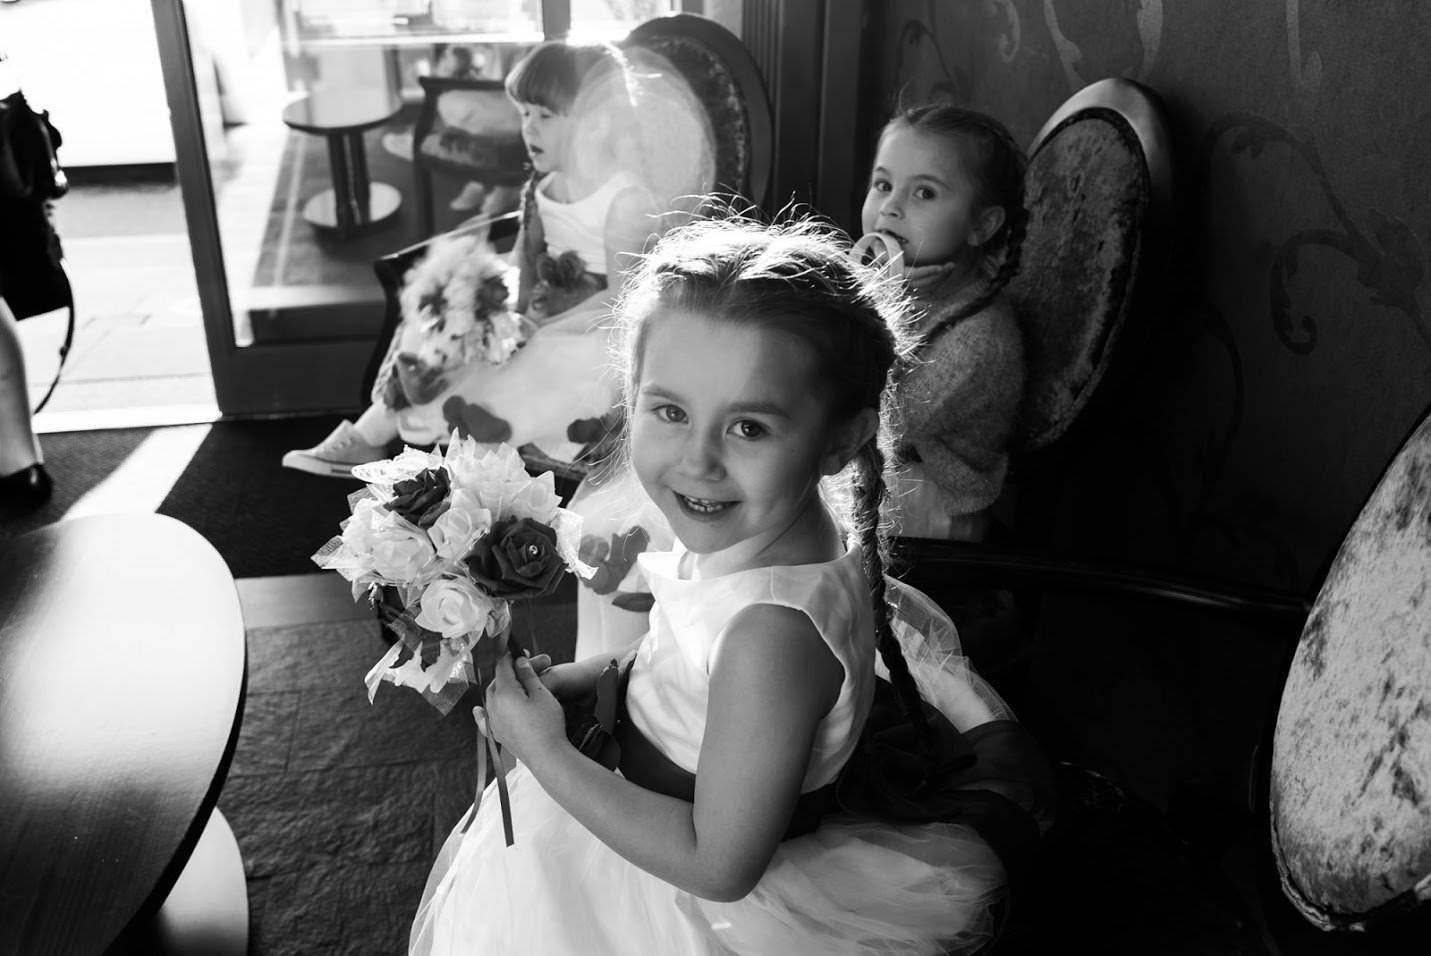 MarkHeather 160042 - Solihull Registry Office Wedding - Mark & Heather